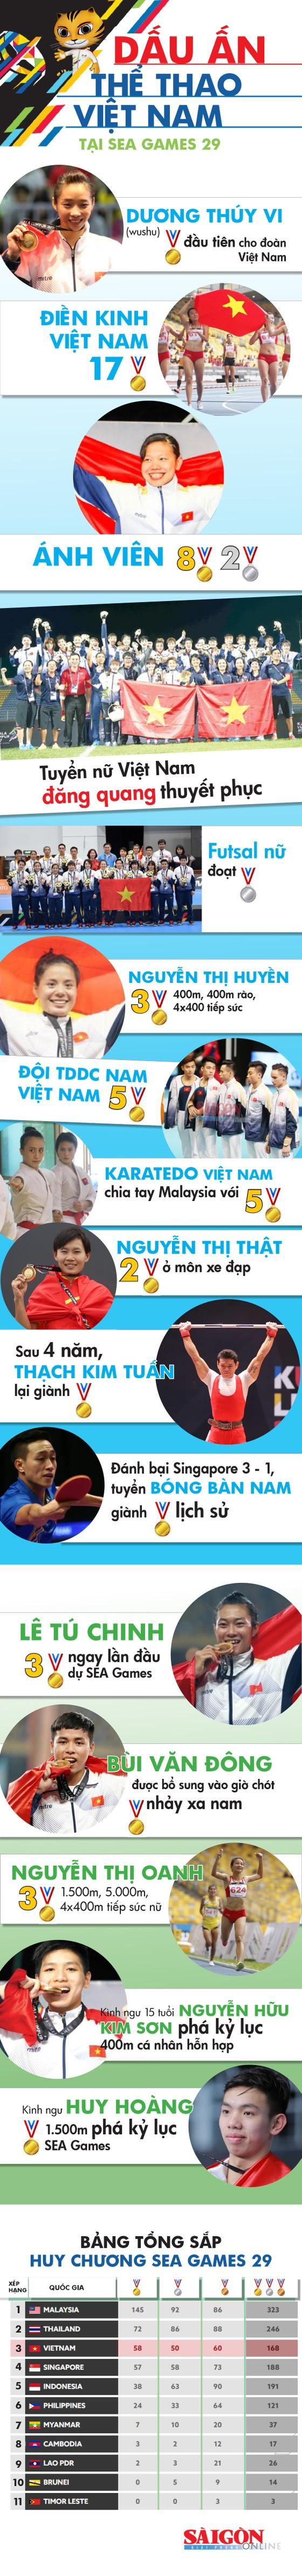 Dấu ấn Việt Nam tại SEA Games 29 ảnh 1